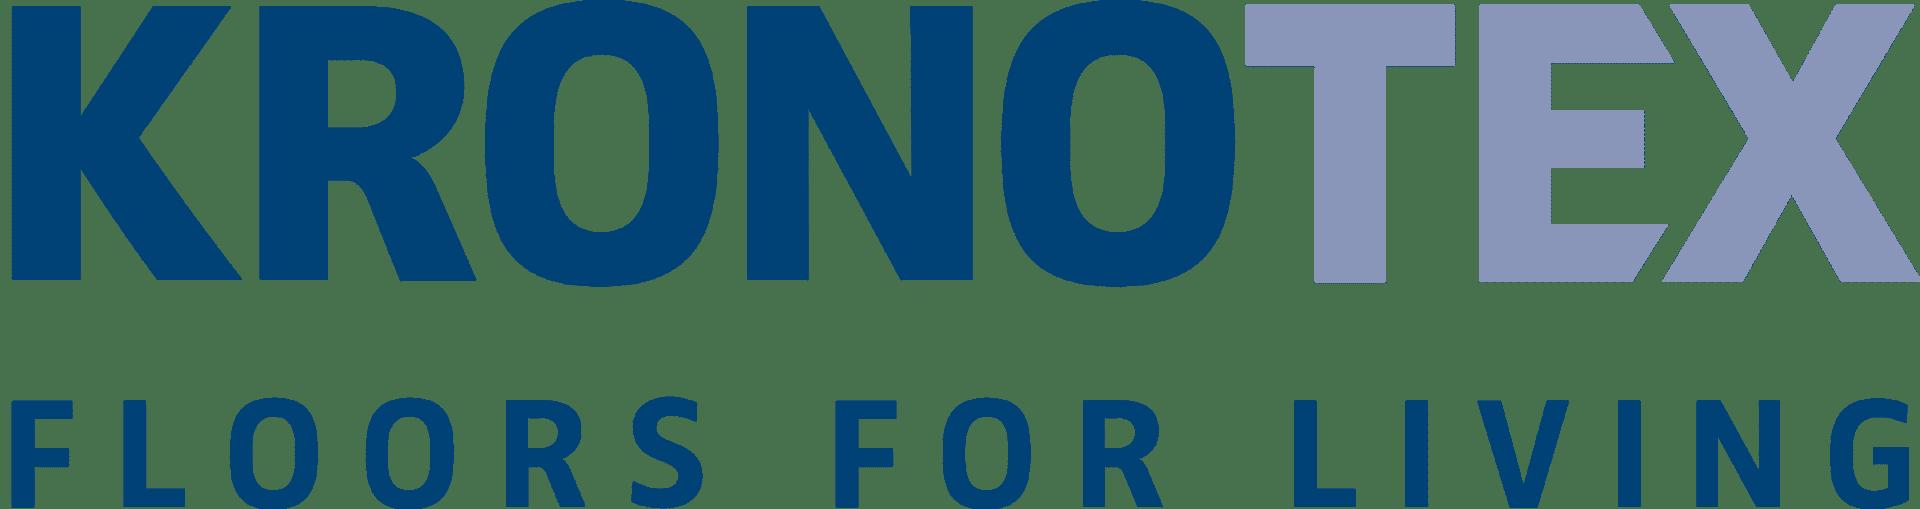 Logo van Kronotex